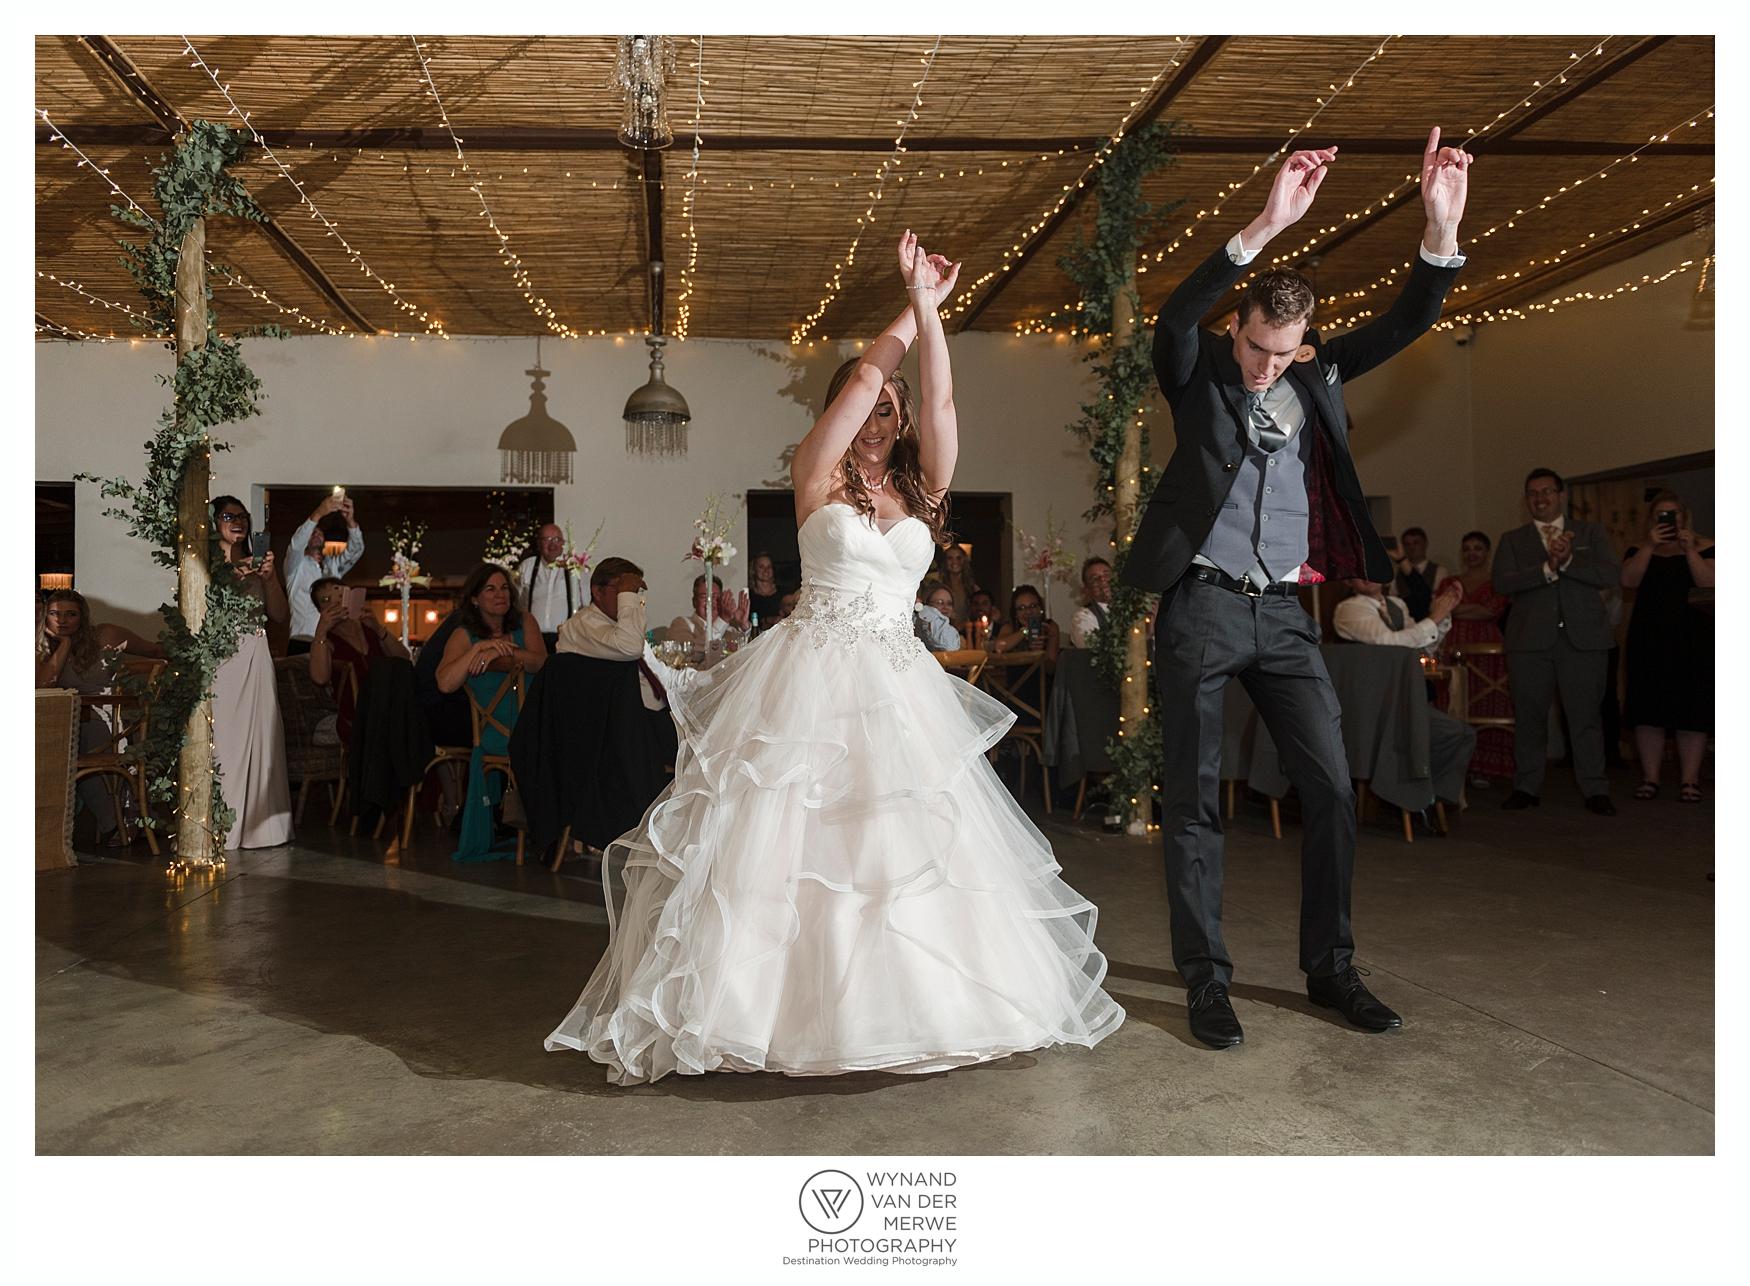 Wynandvandermerwe ryan natalia wedding photography cradle valley guesthouse gauteng-706.jpg